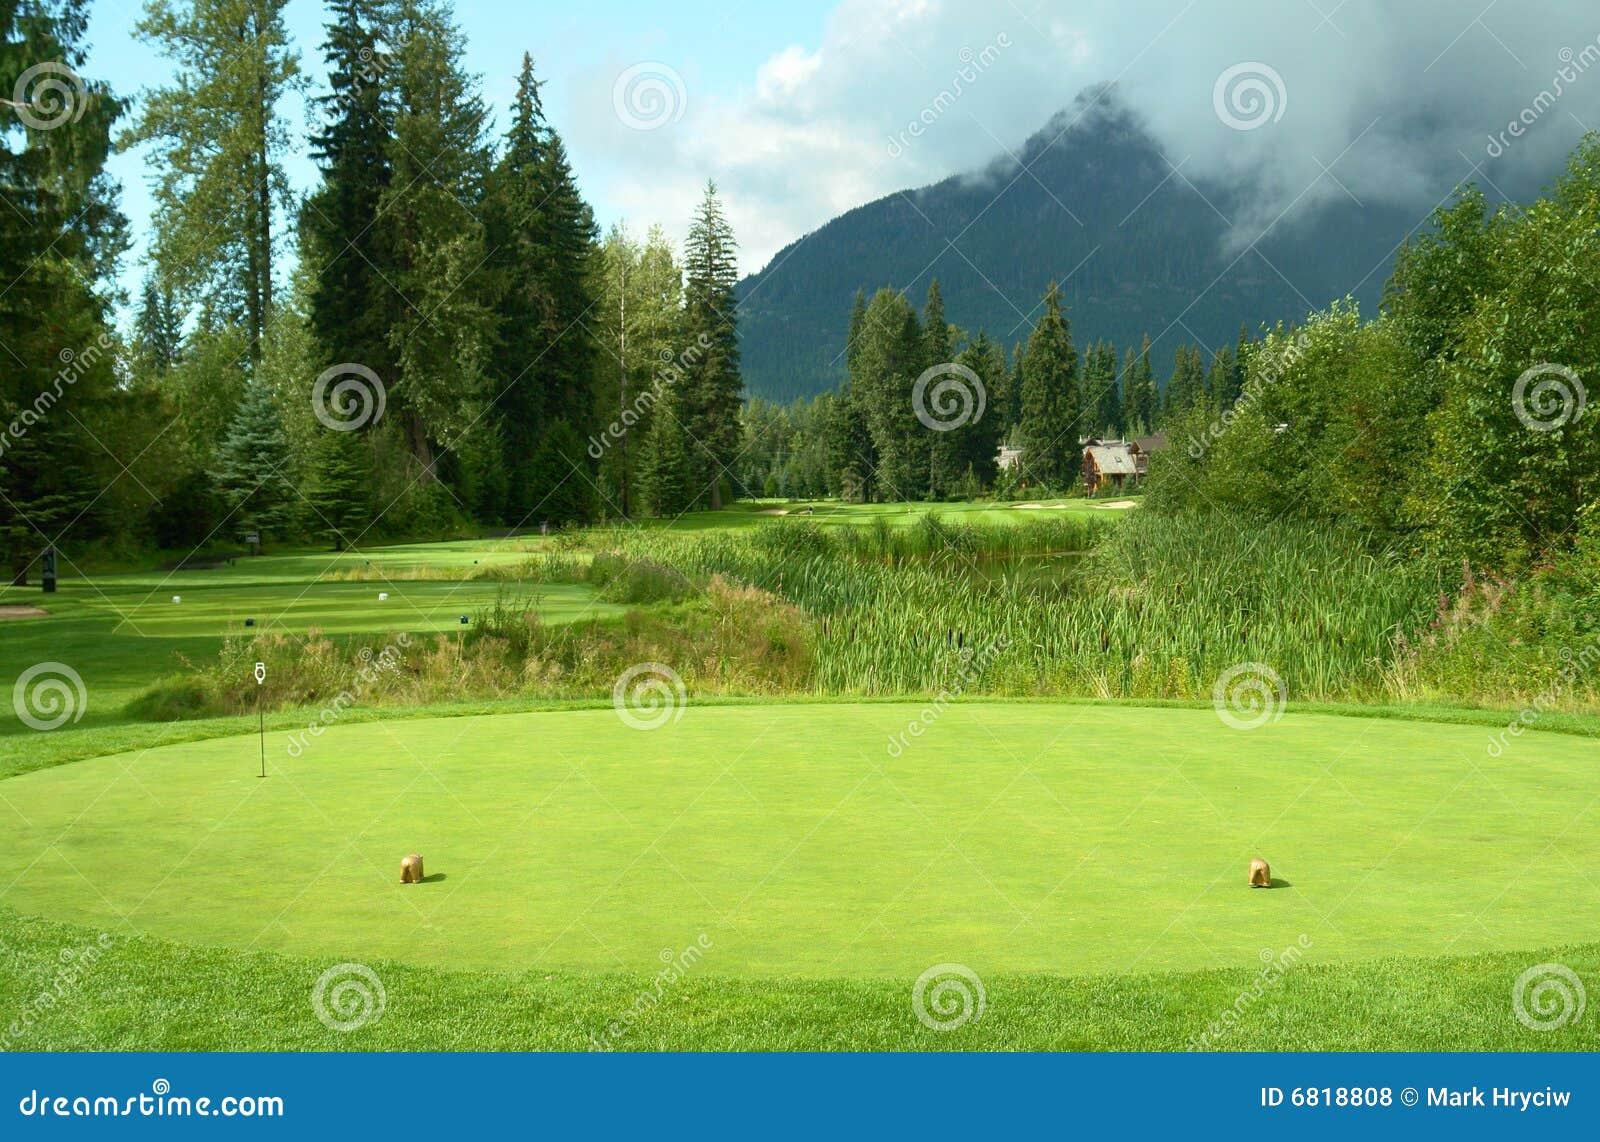 Golf Course Tee Off Box